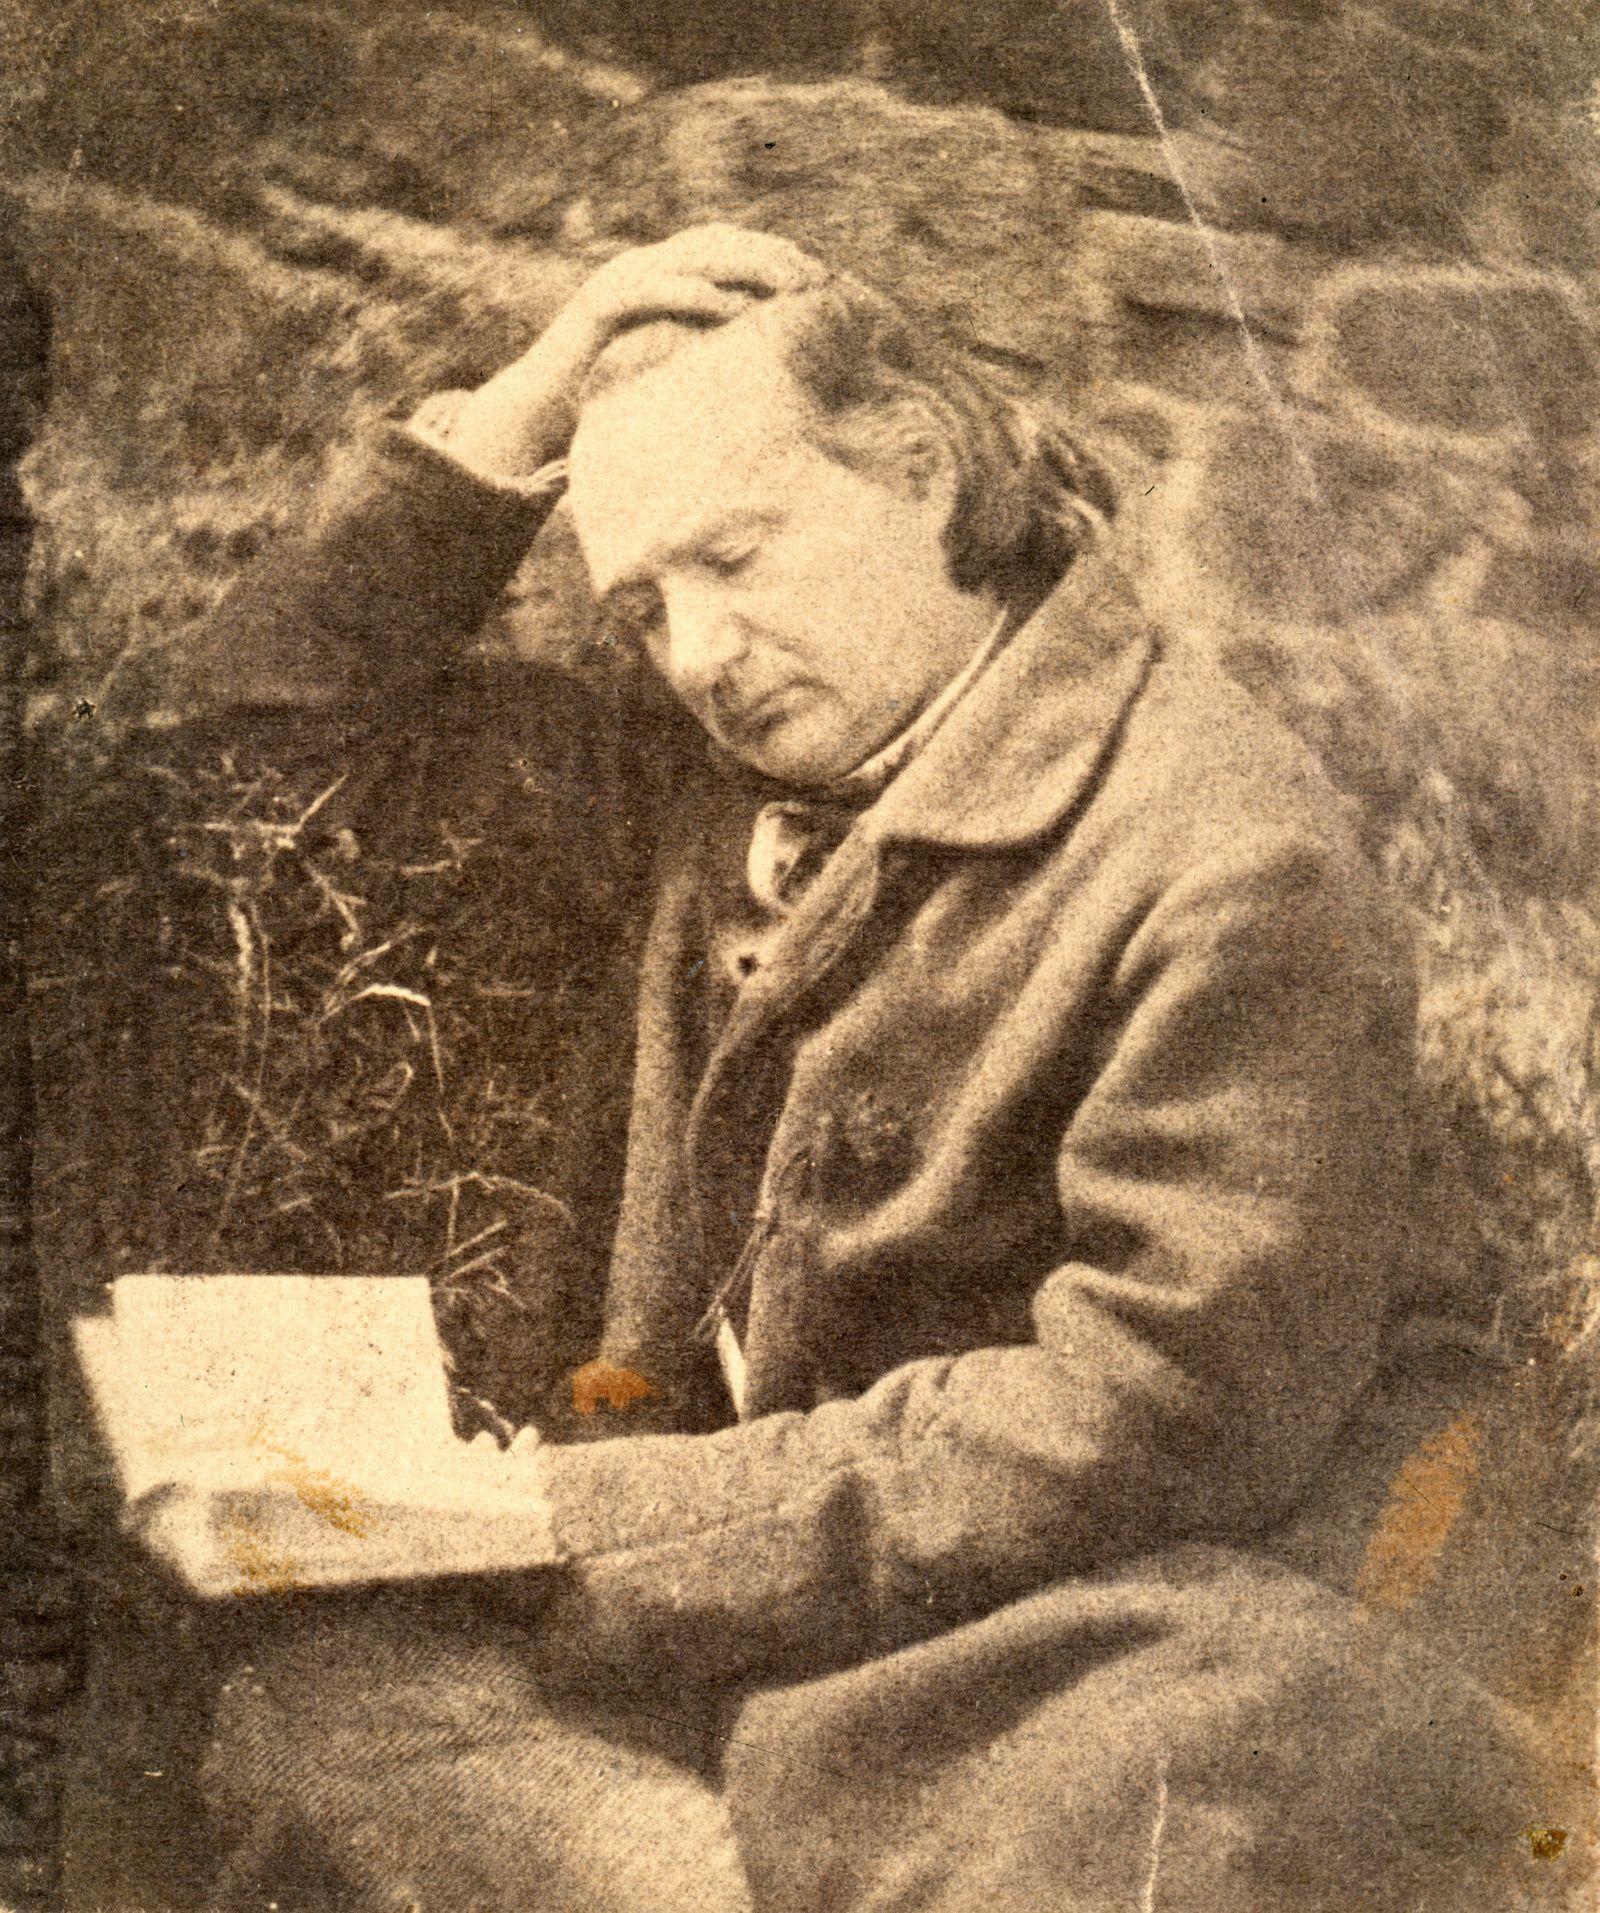 Victor Hugo (1802-1885), French writer,